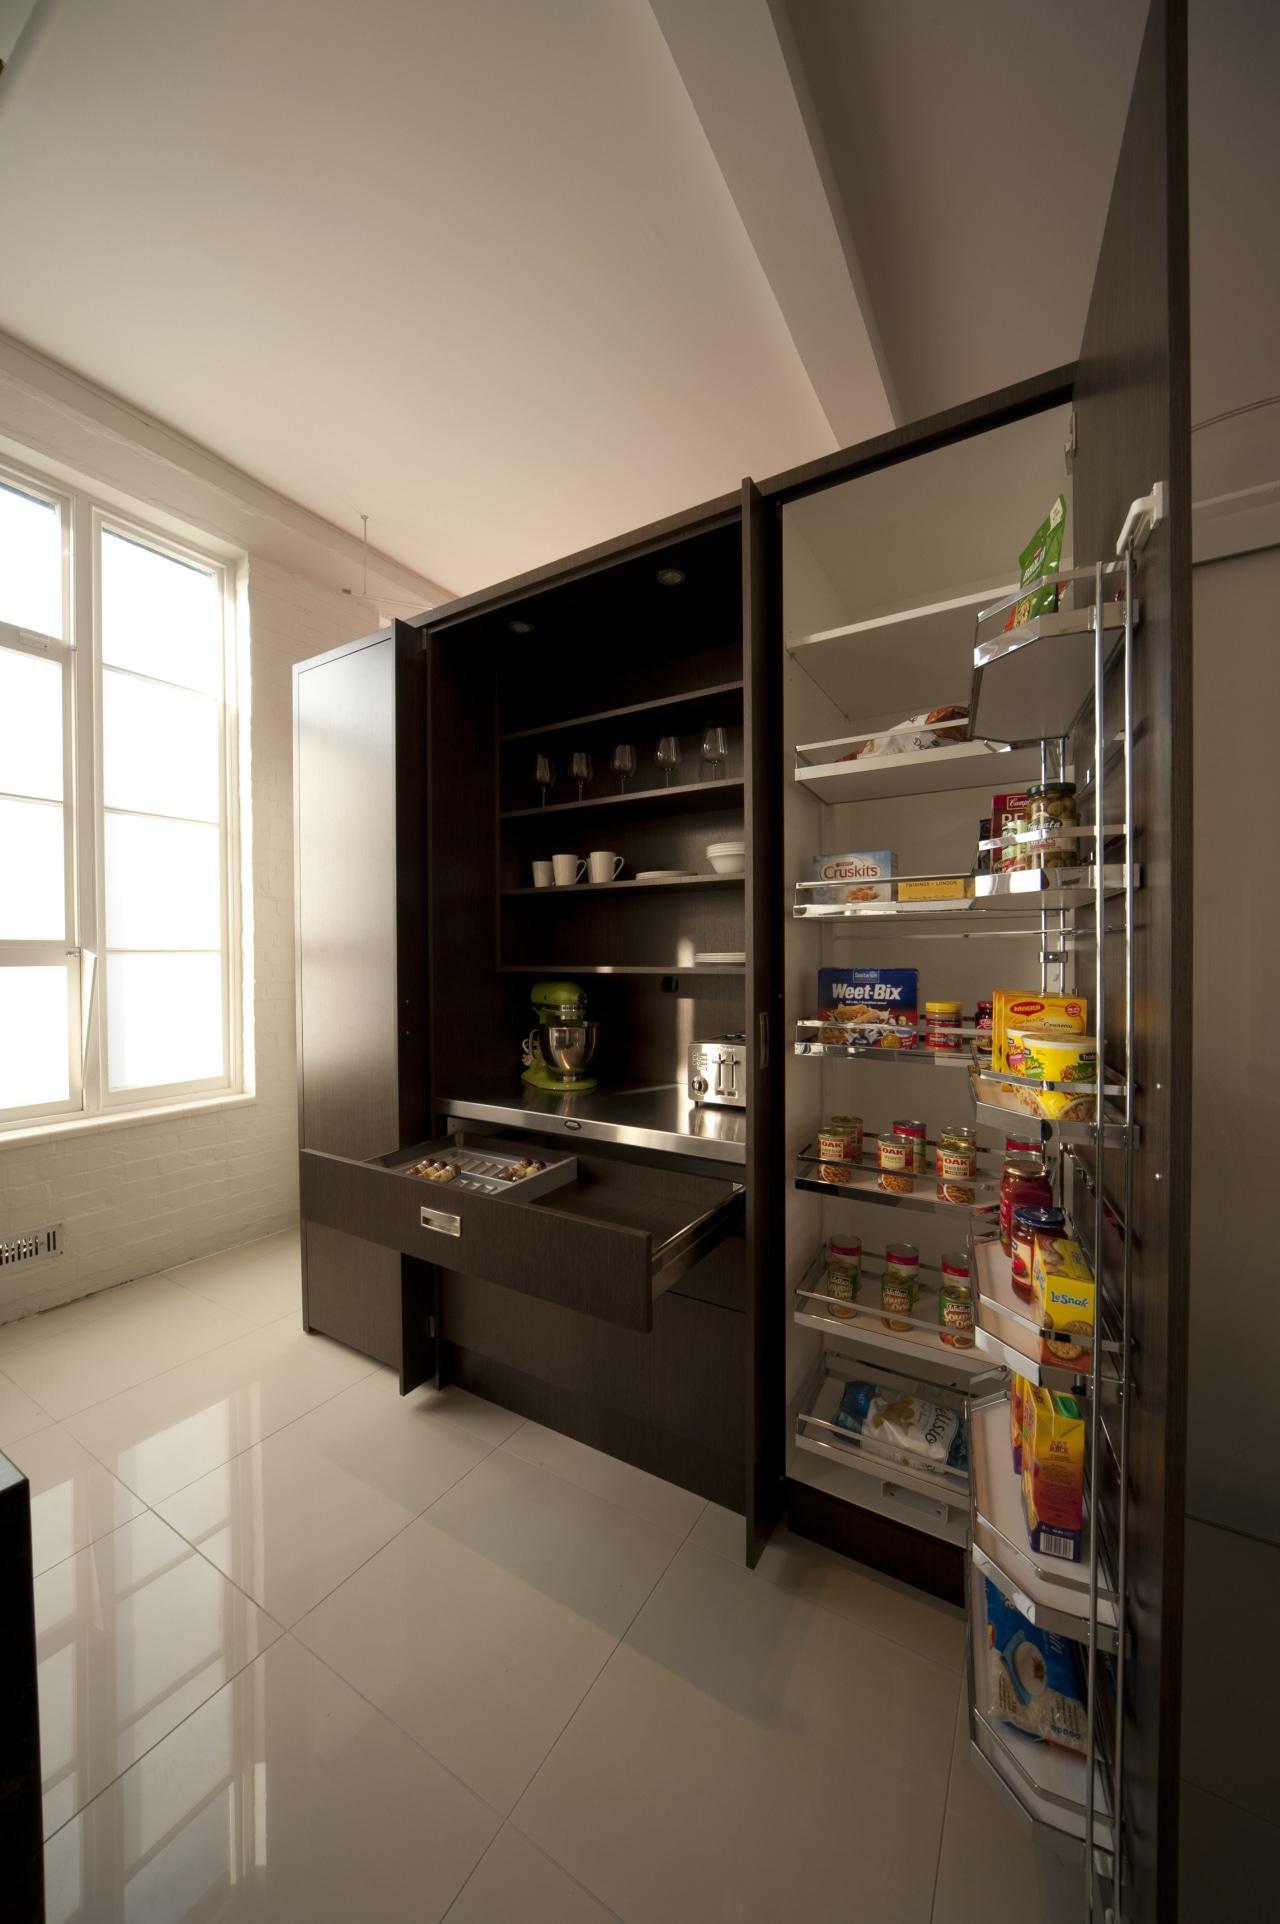 Upmarket kitchen cabinet. Allure Oak. Matt finish. Vertical interior design, refrigerator, shelf, shelving, brown, gray